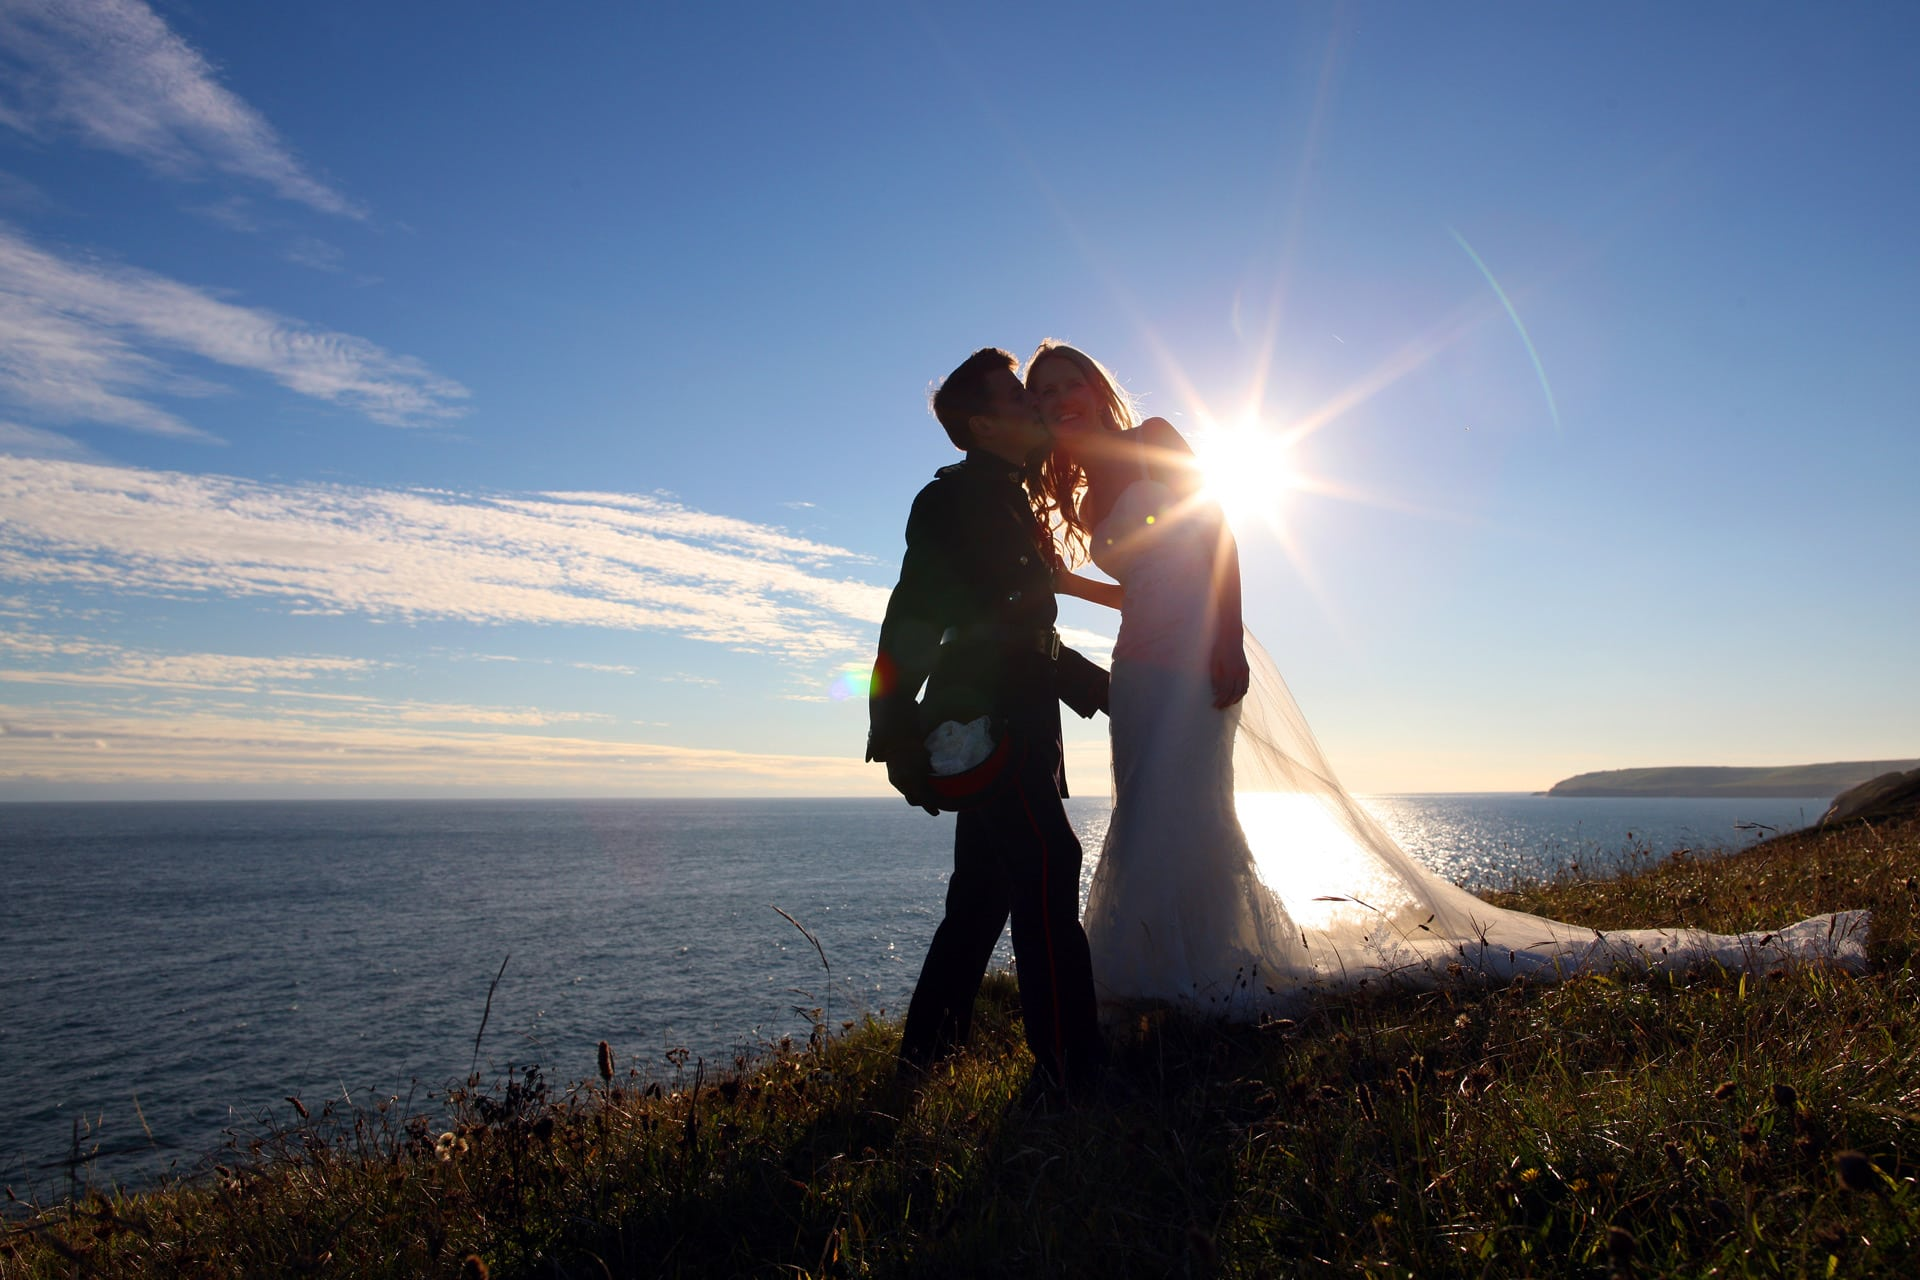 soldier-kisses-bride-on-clifftop-as-sun-sets